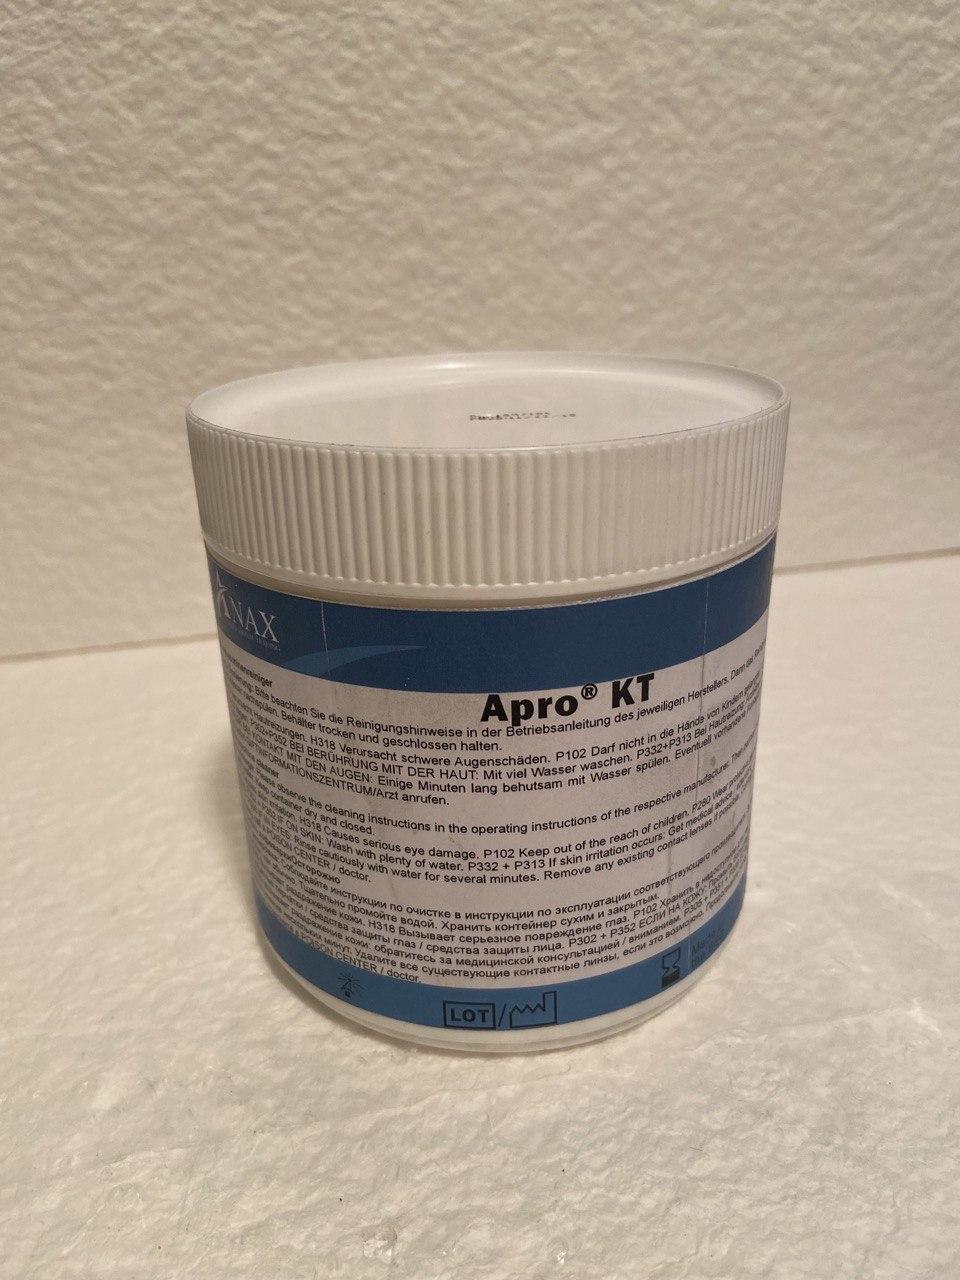 Моющее средство APRO КТ ANAX